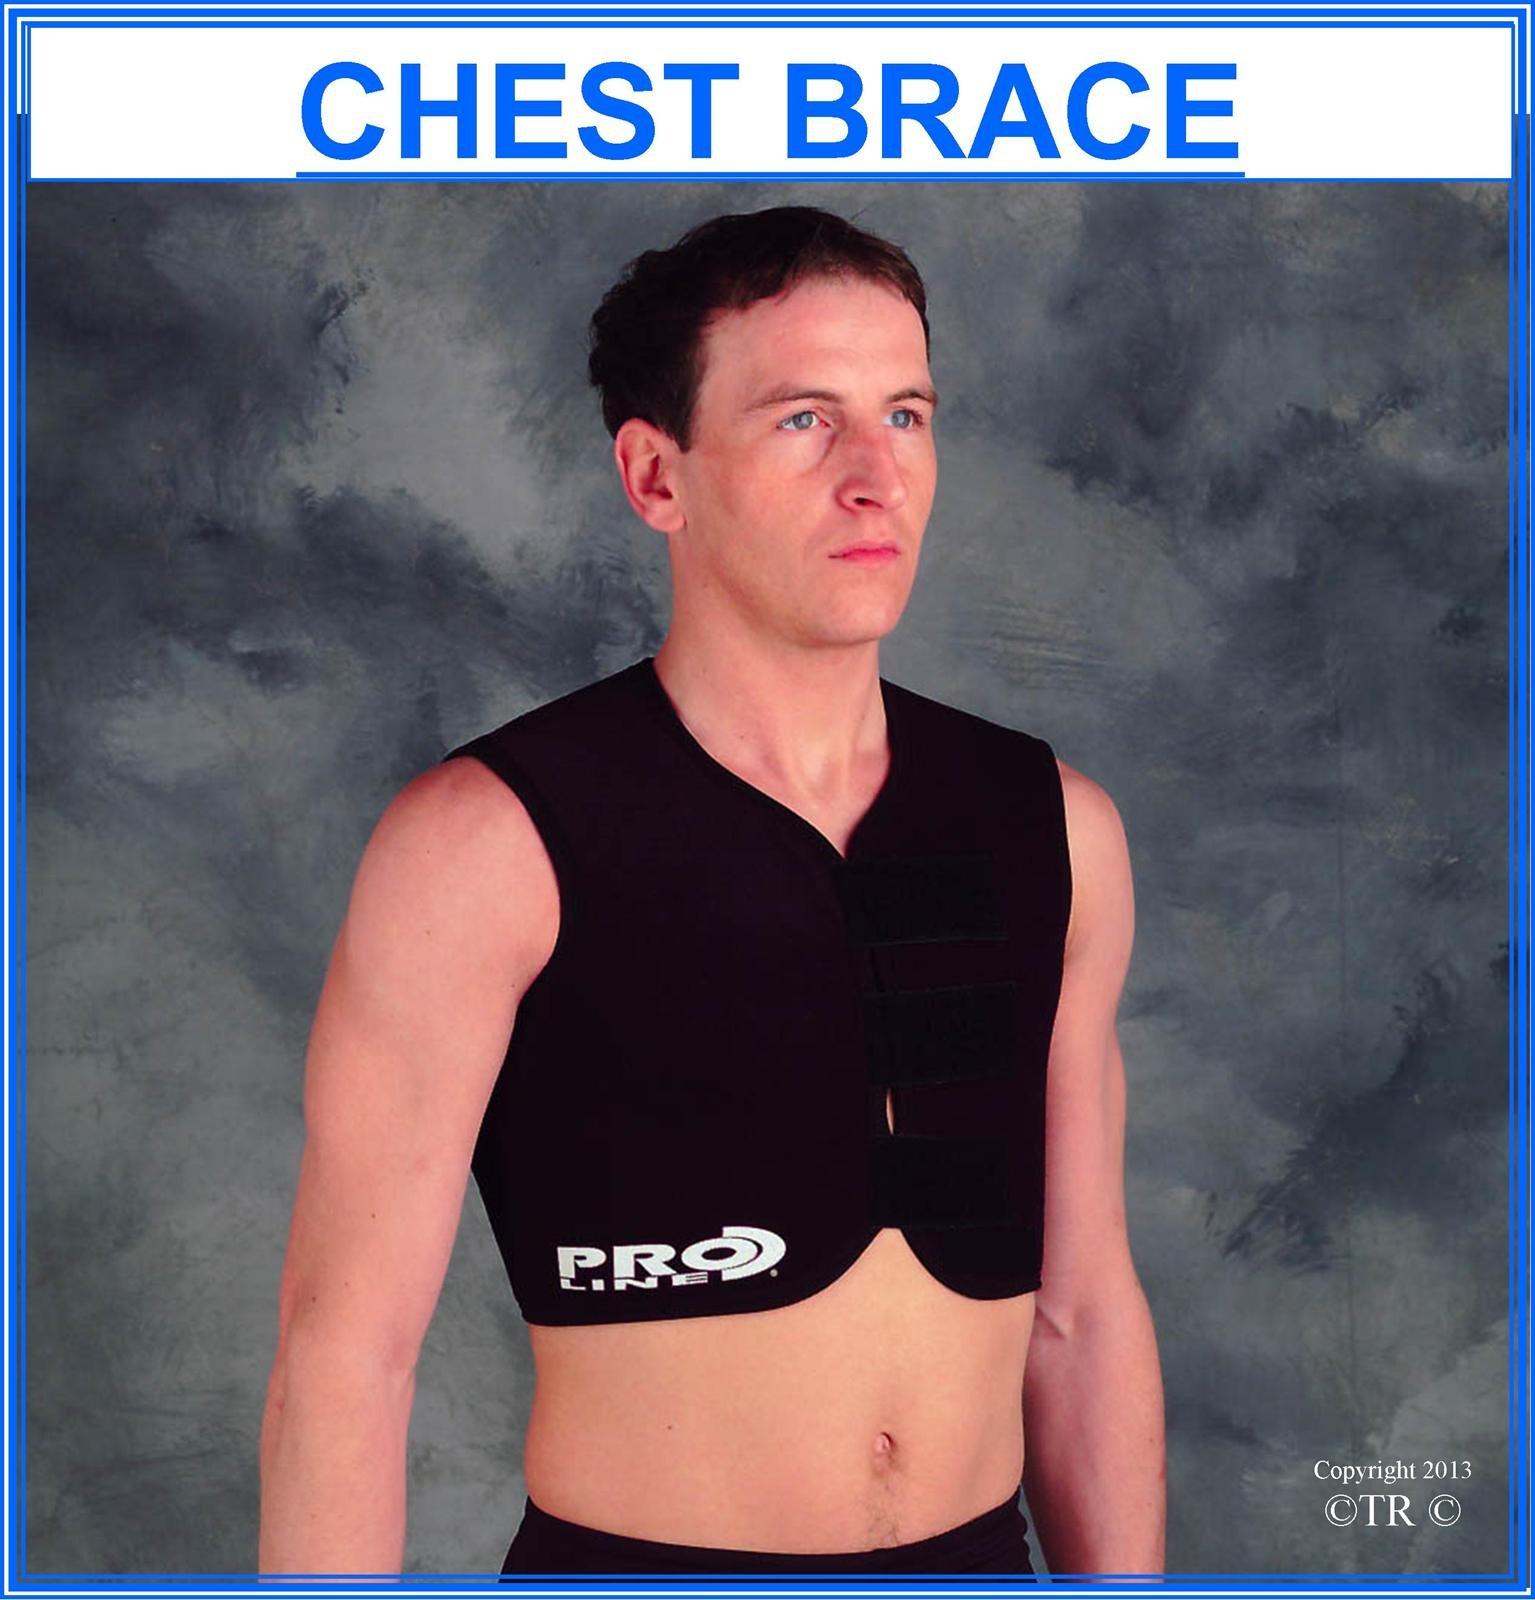 Proline Chest Brace - Black - Small/Medium